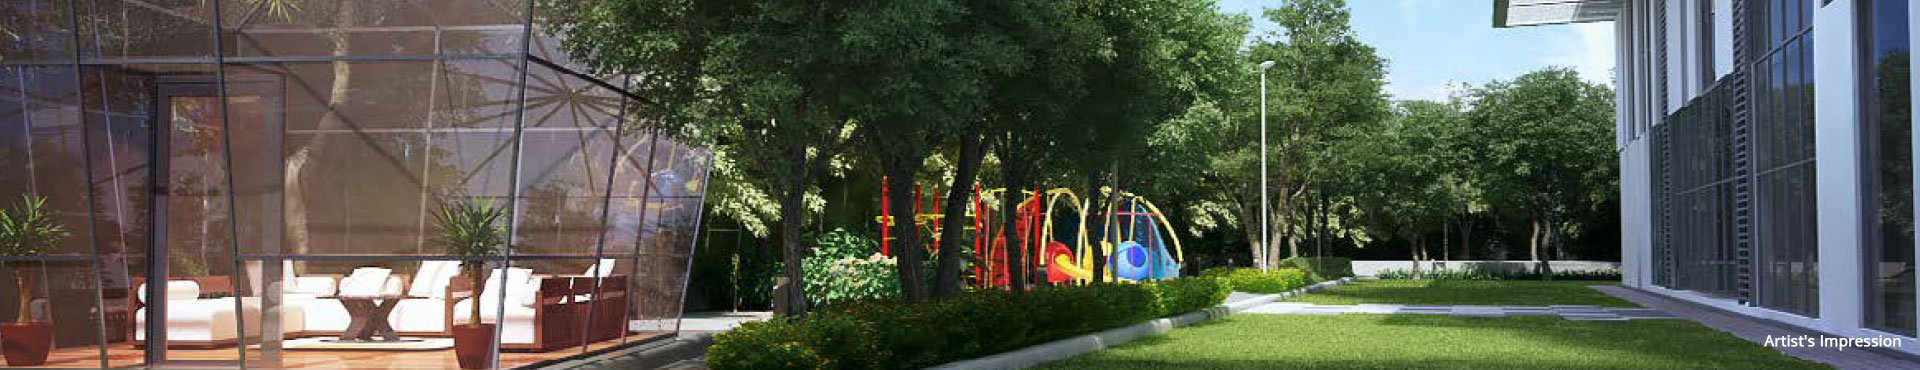 Kolte Patil itowers-exente Garden